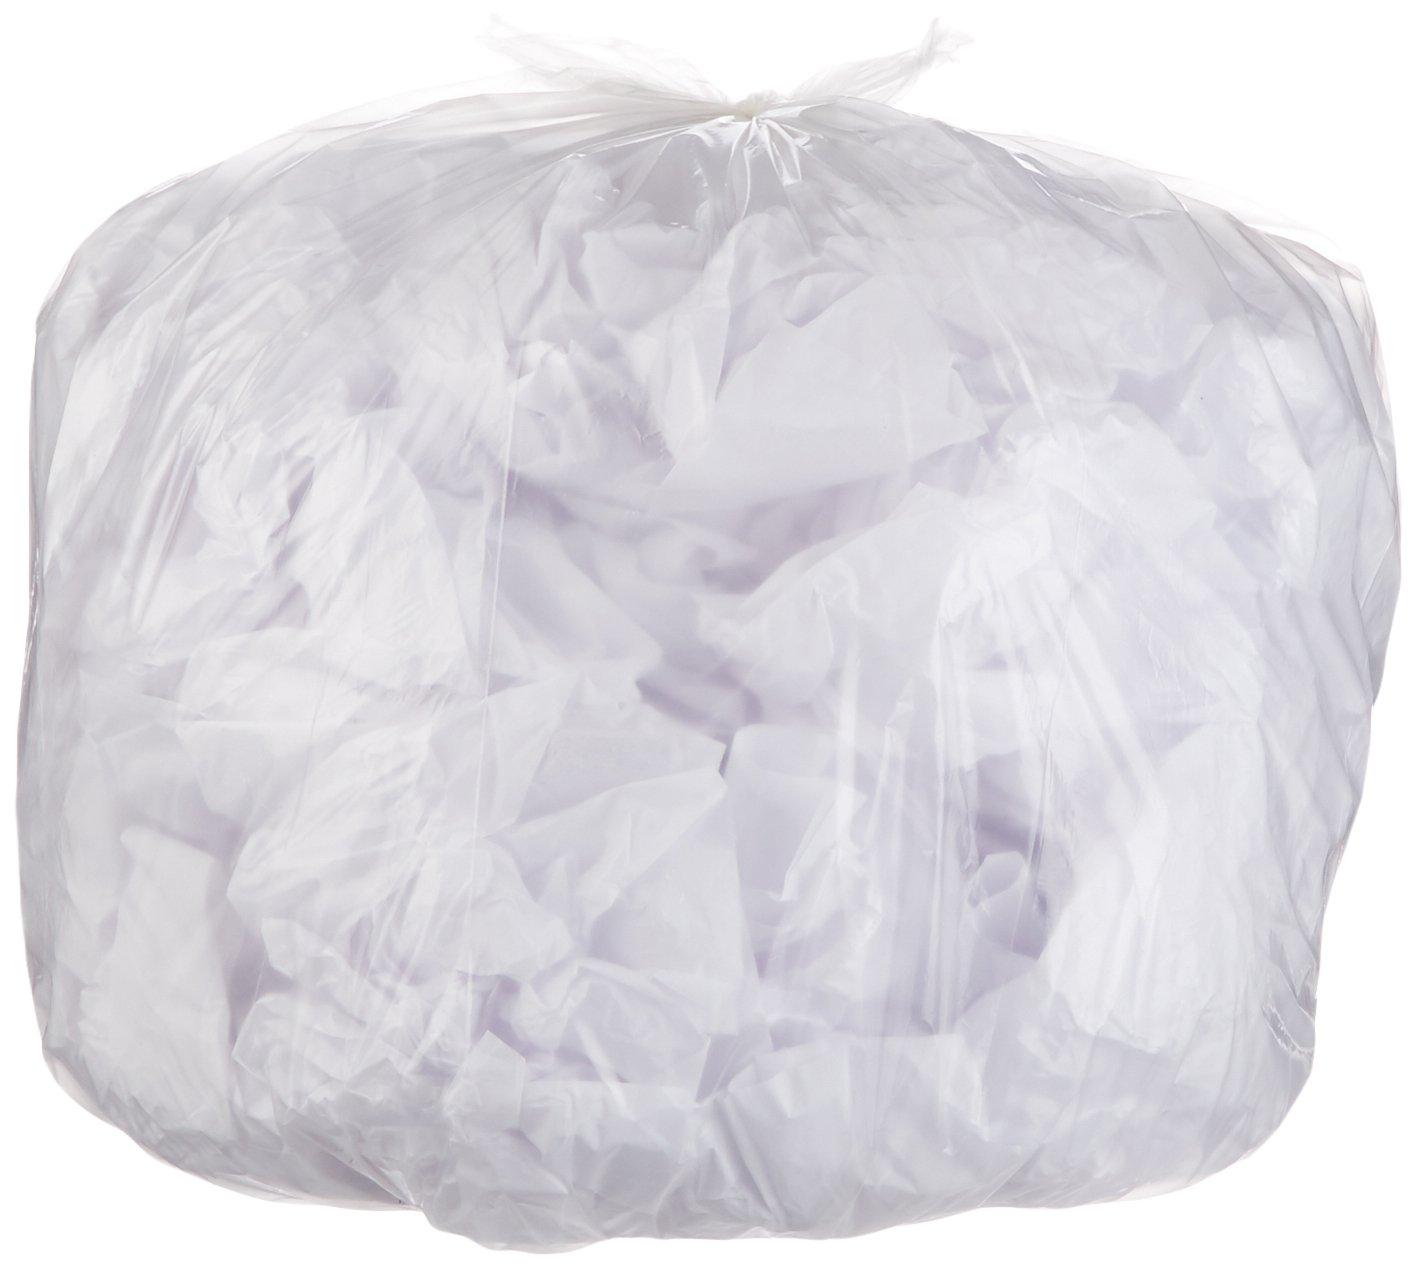 AmazonBasics 45 Gallon Recycling Trash Bag, 1.1 mil, Clear, 150-Count by AmazonBasics (Image #1)